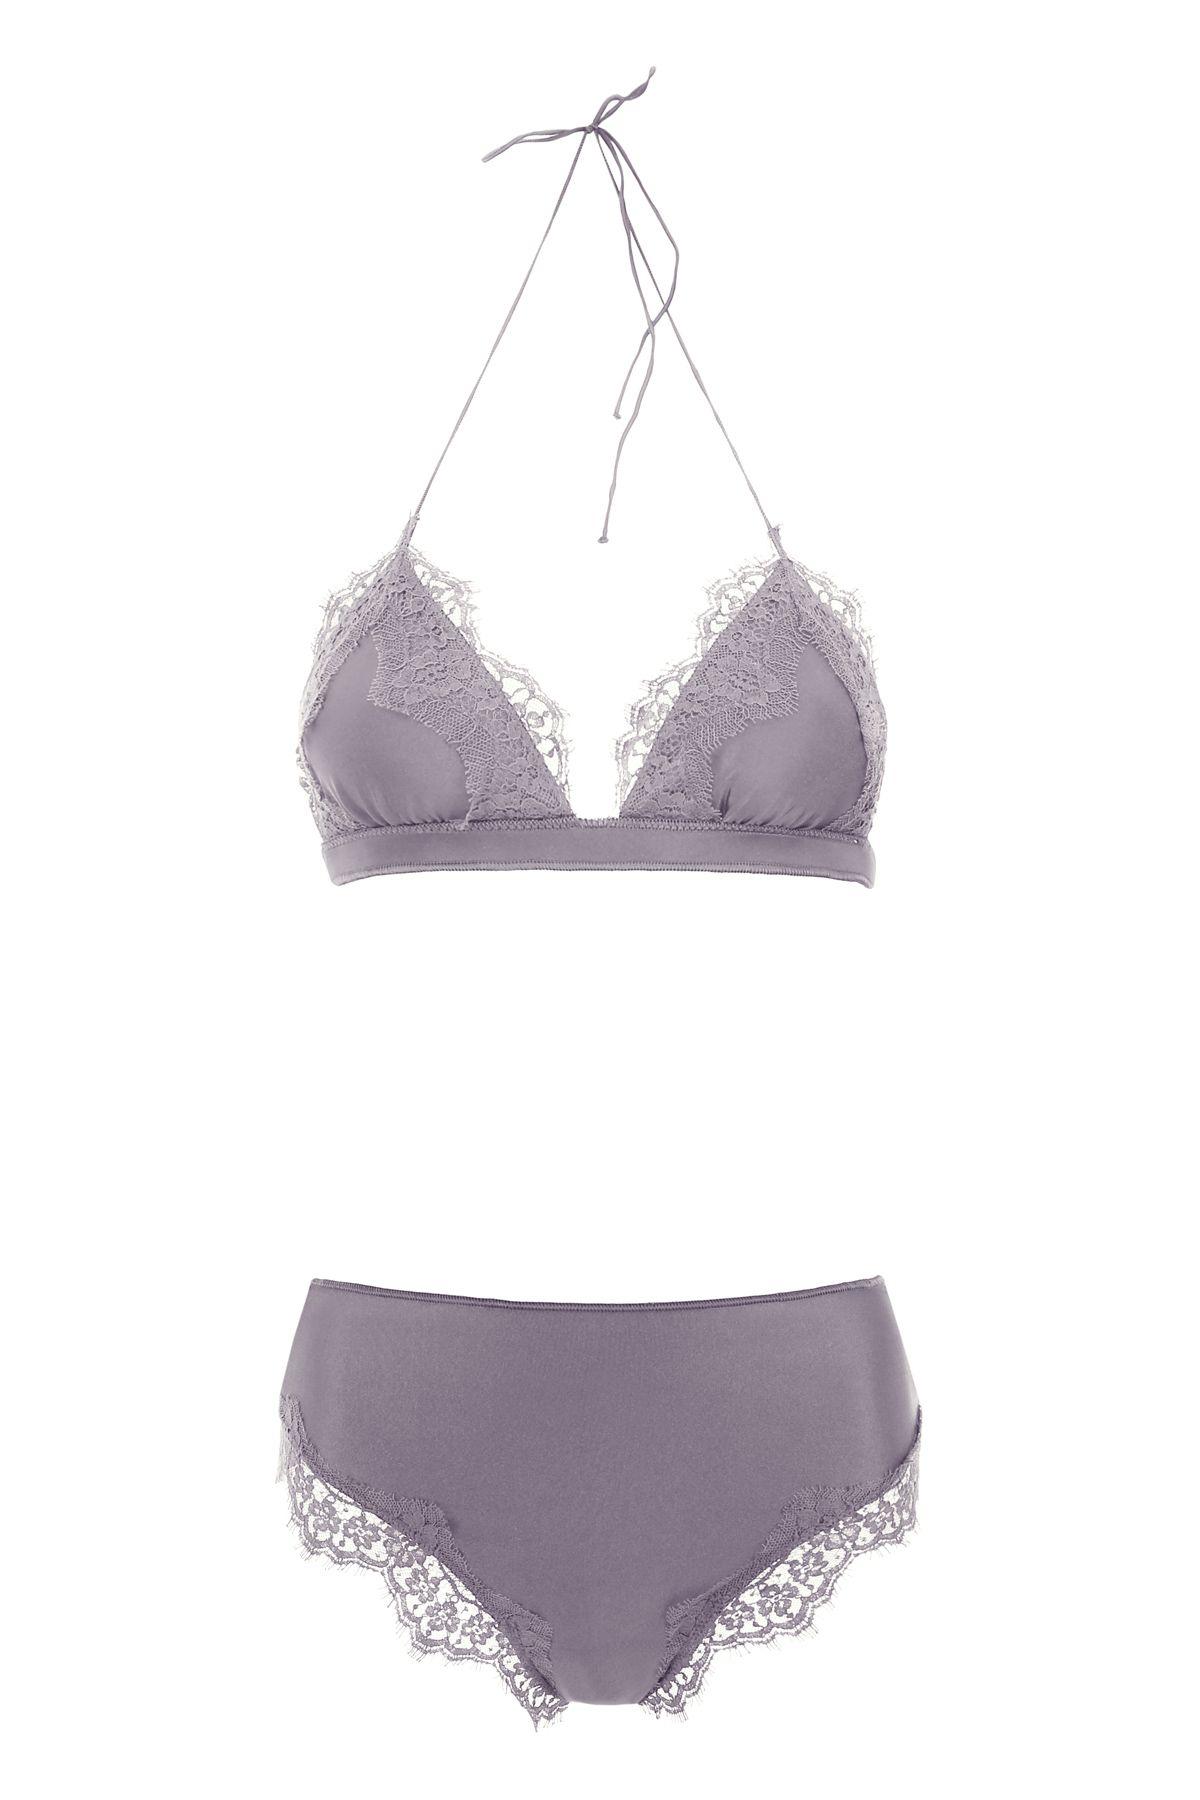 2bad15aca6860 Oseree Oseree Travaillé Bikini With Lace - GREY (Grey) - 10953525 ...